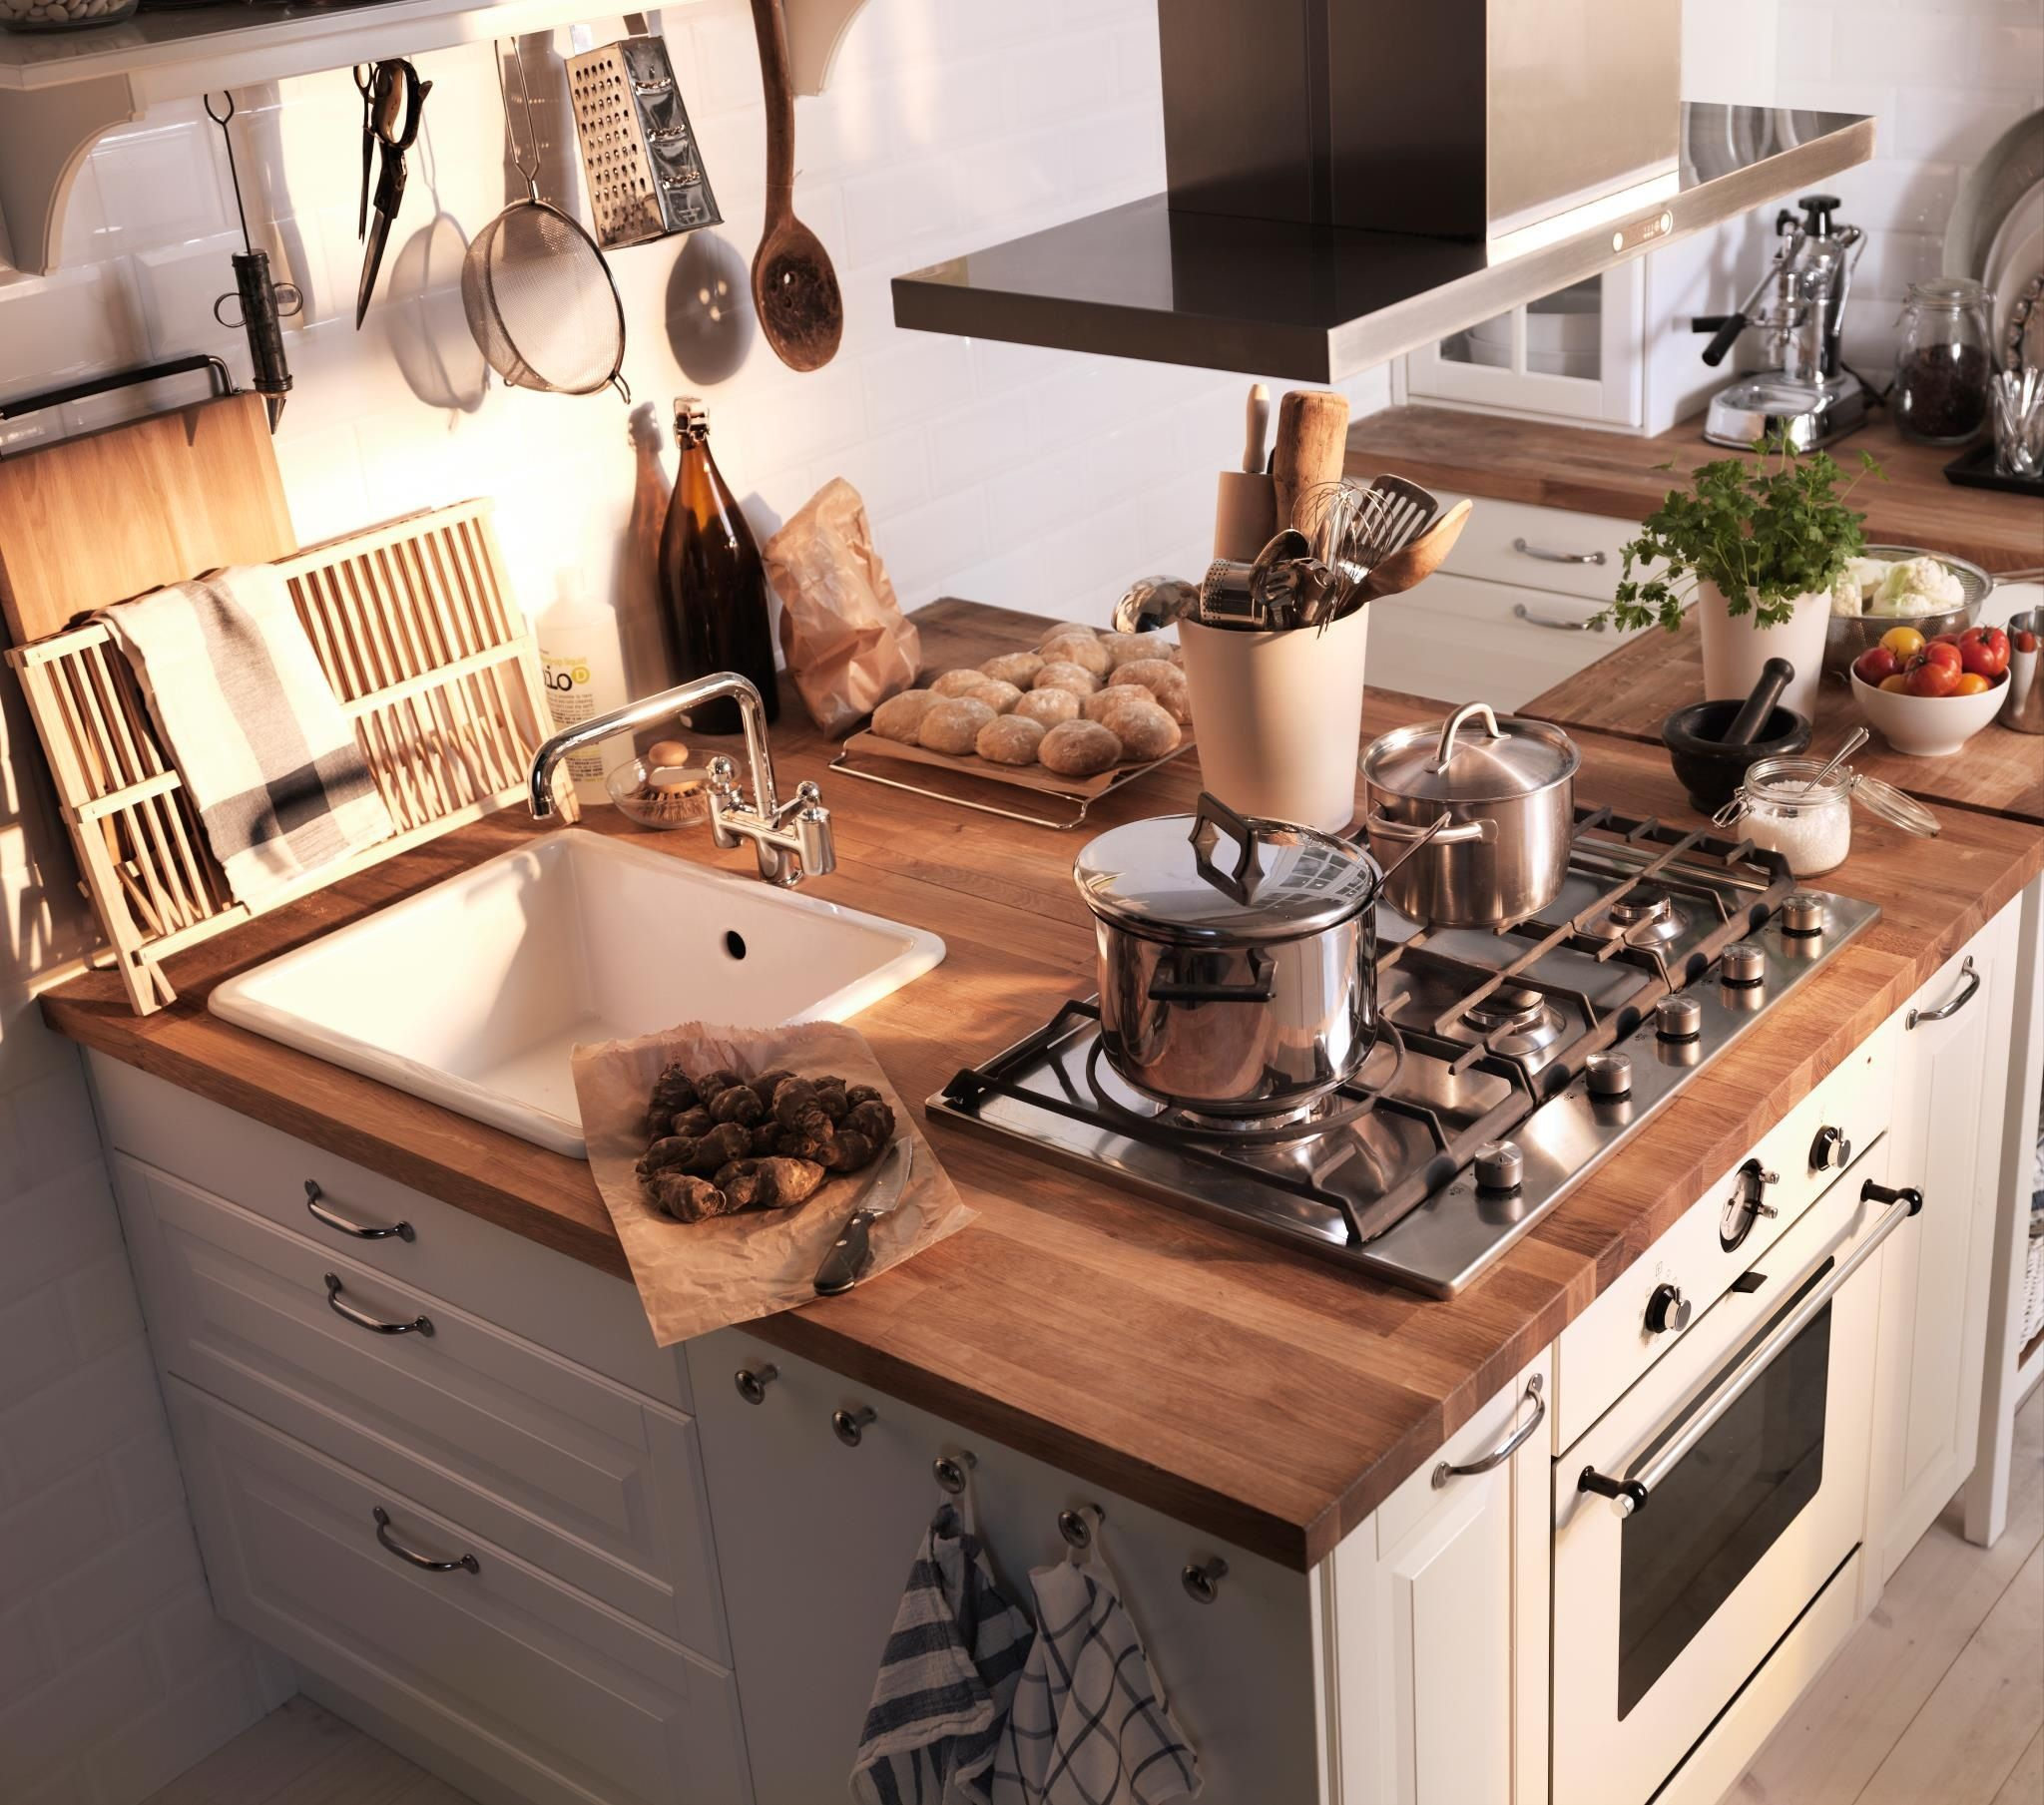 Rustic Kitchen (Ikea)